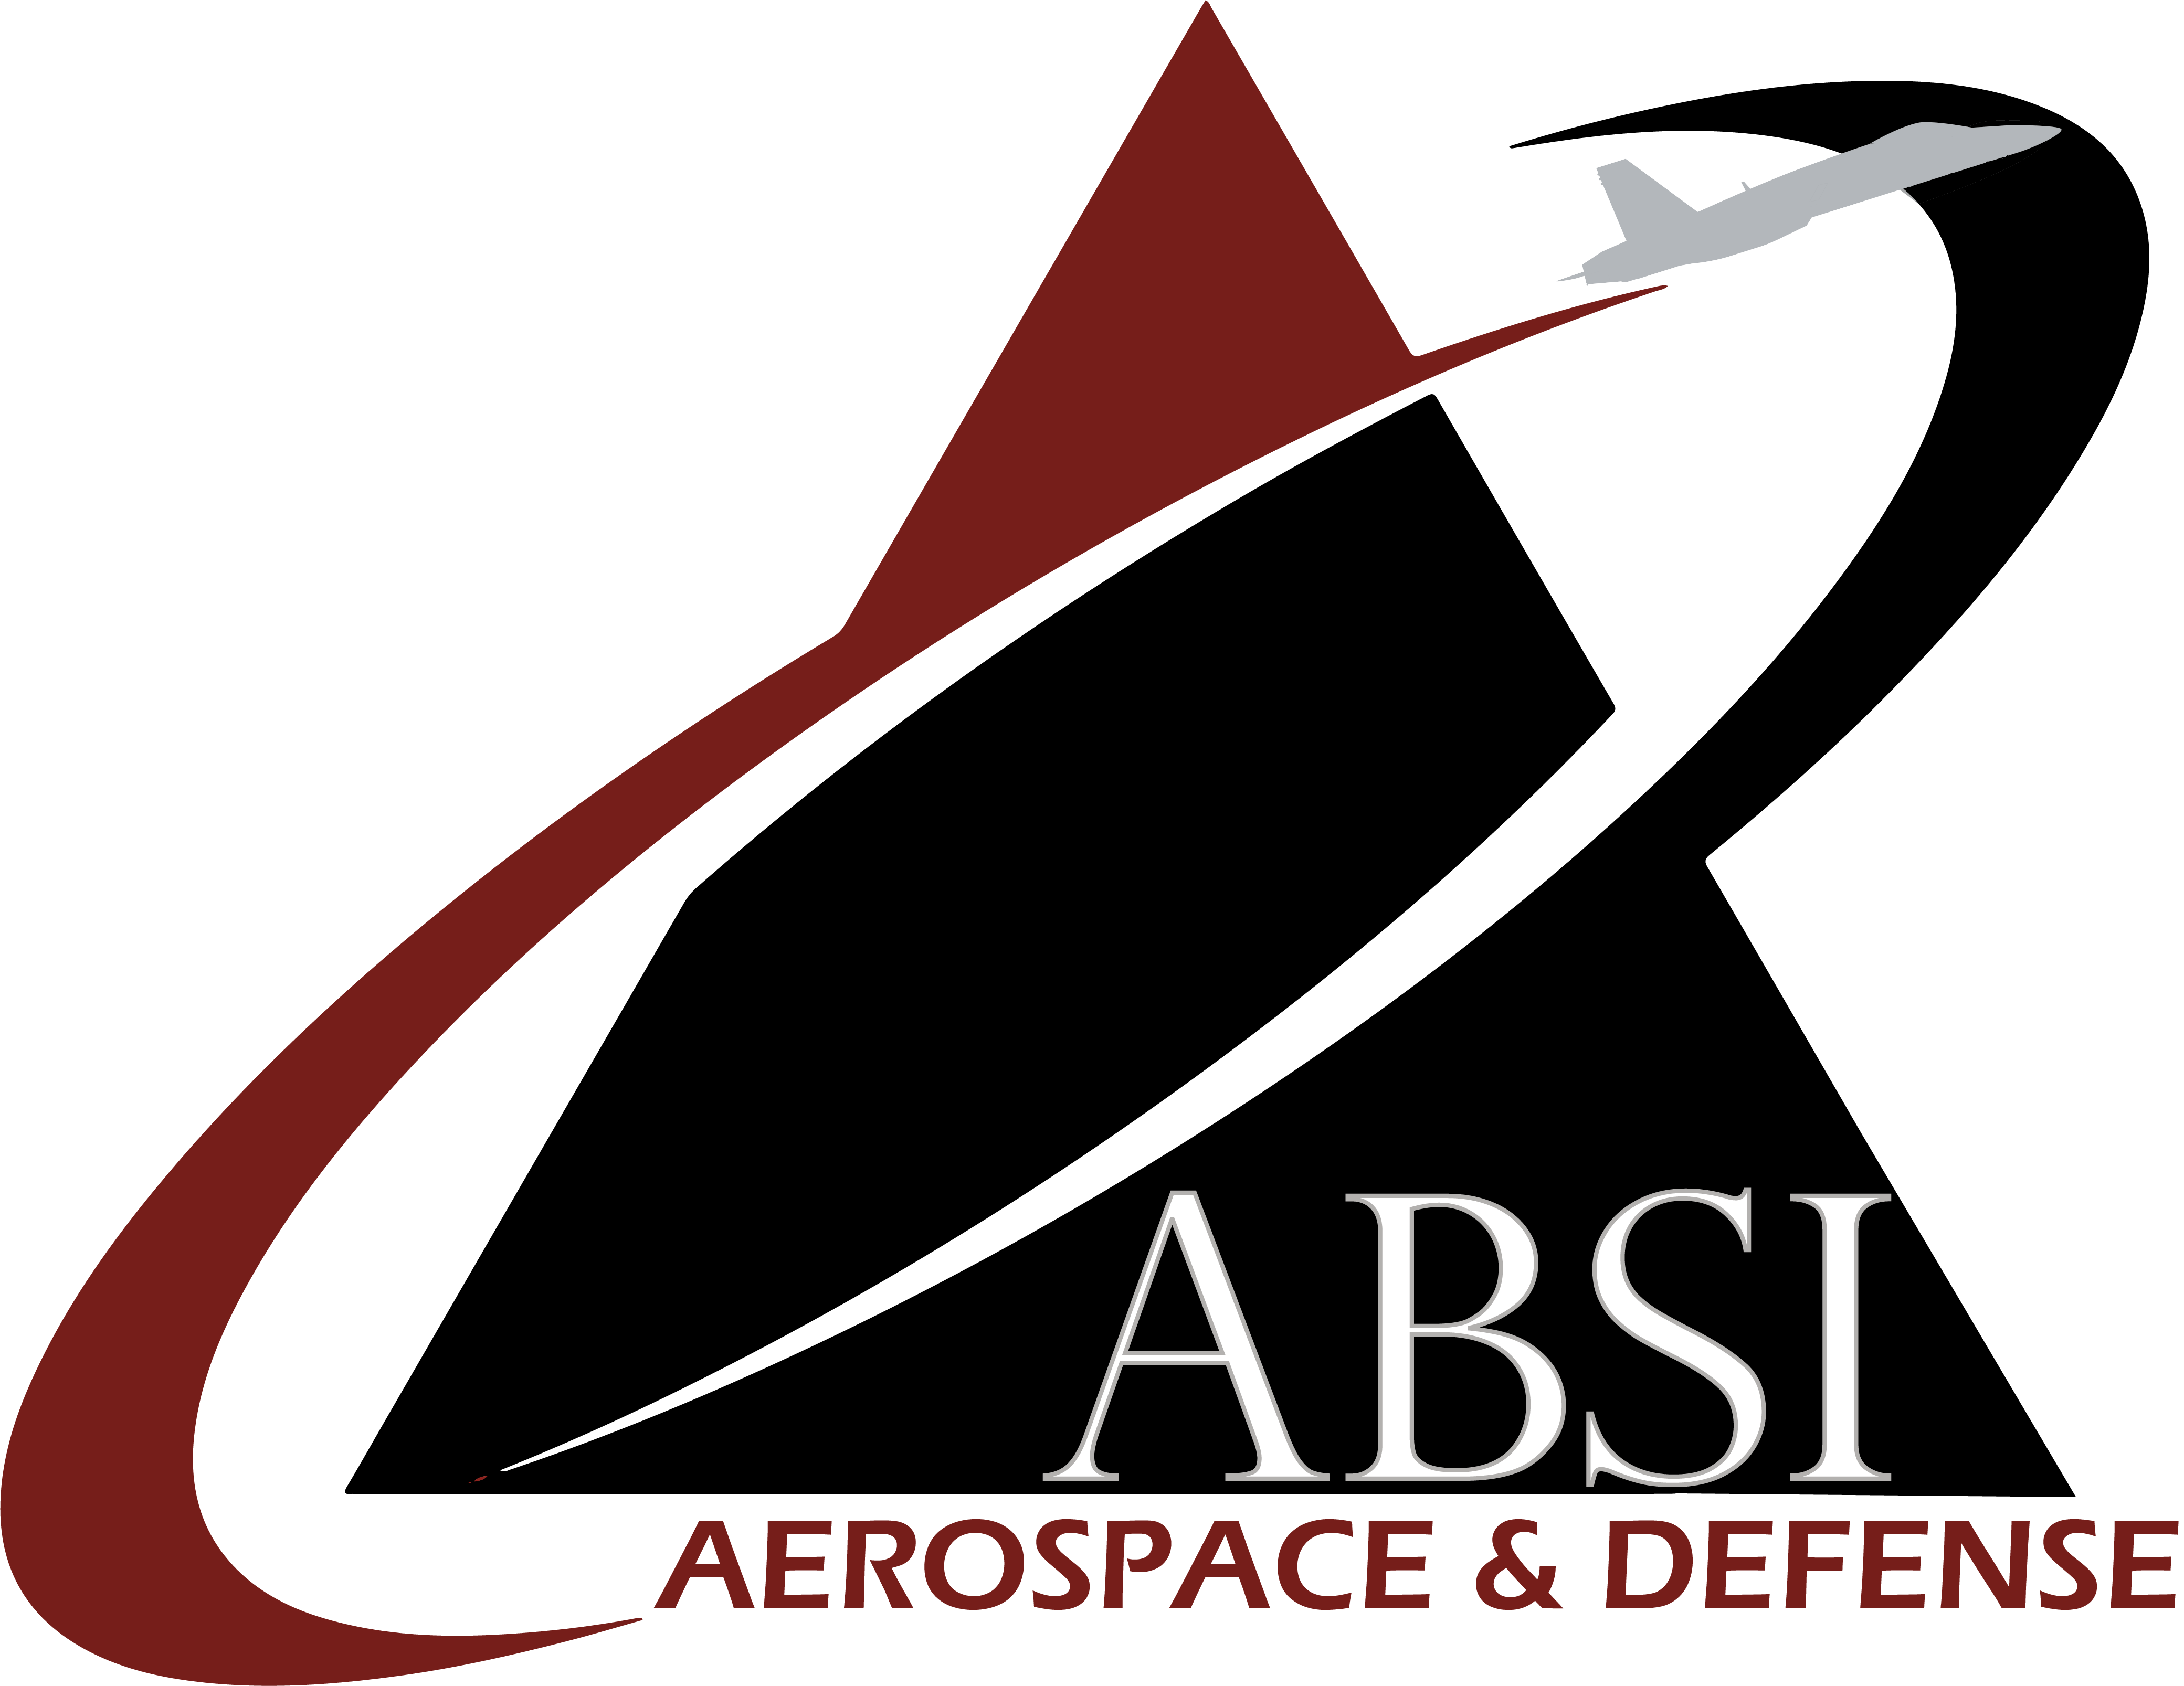 ABSI Aerospace & Defense